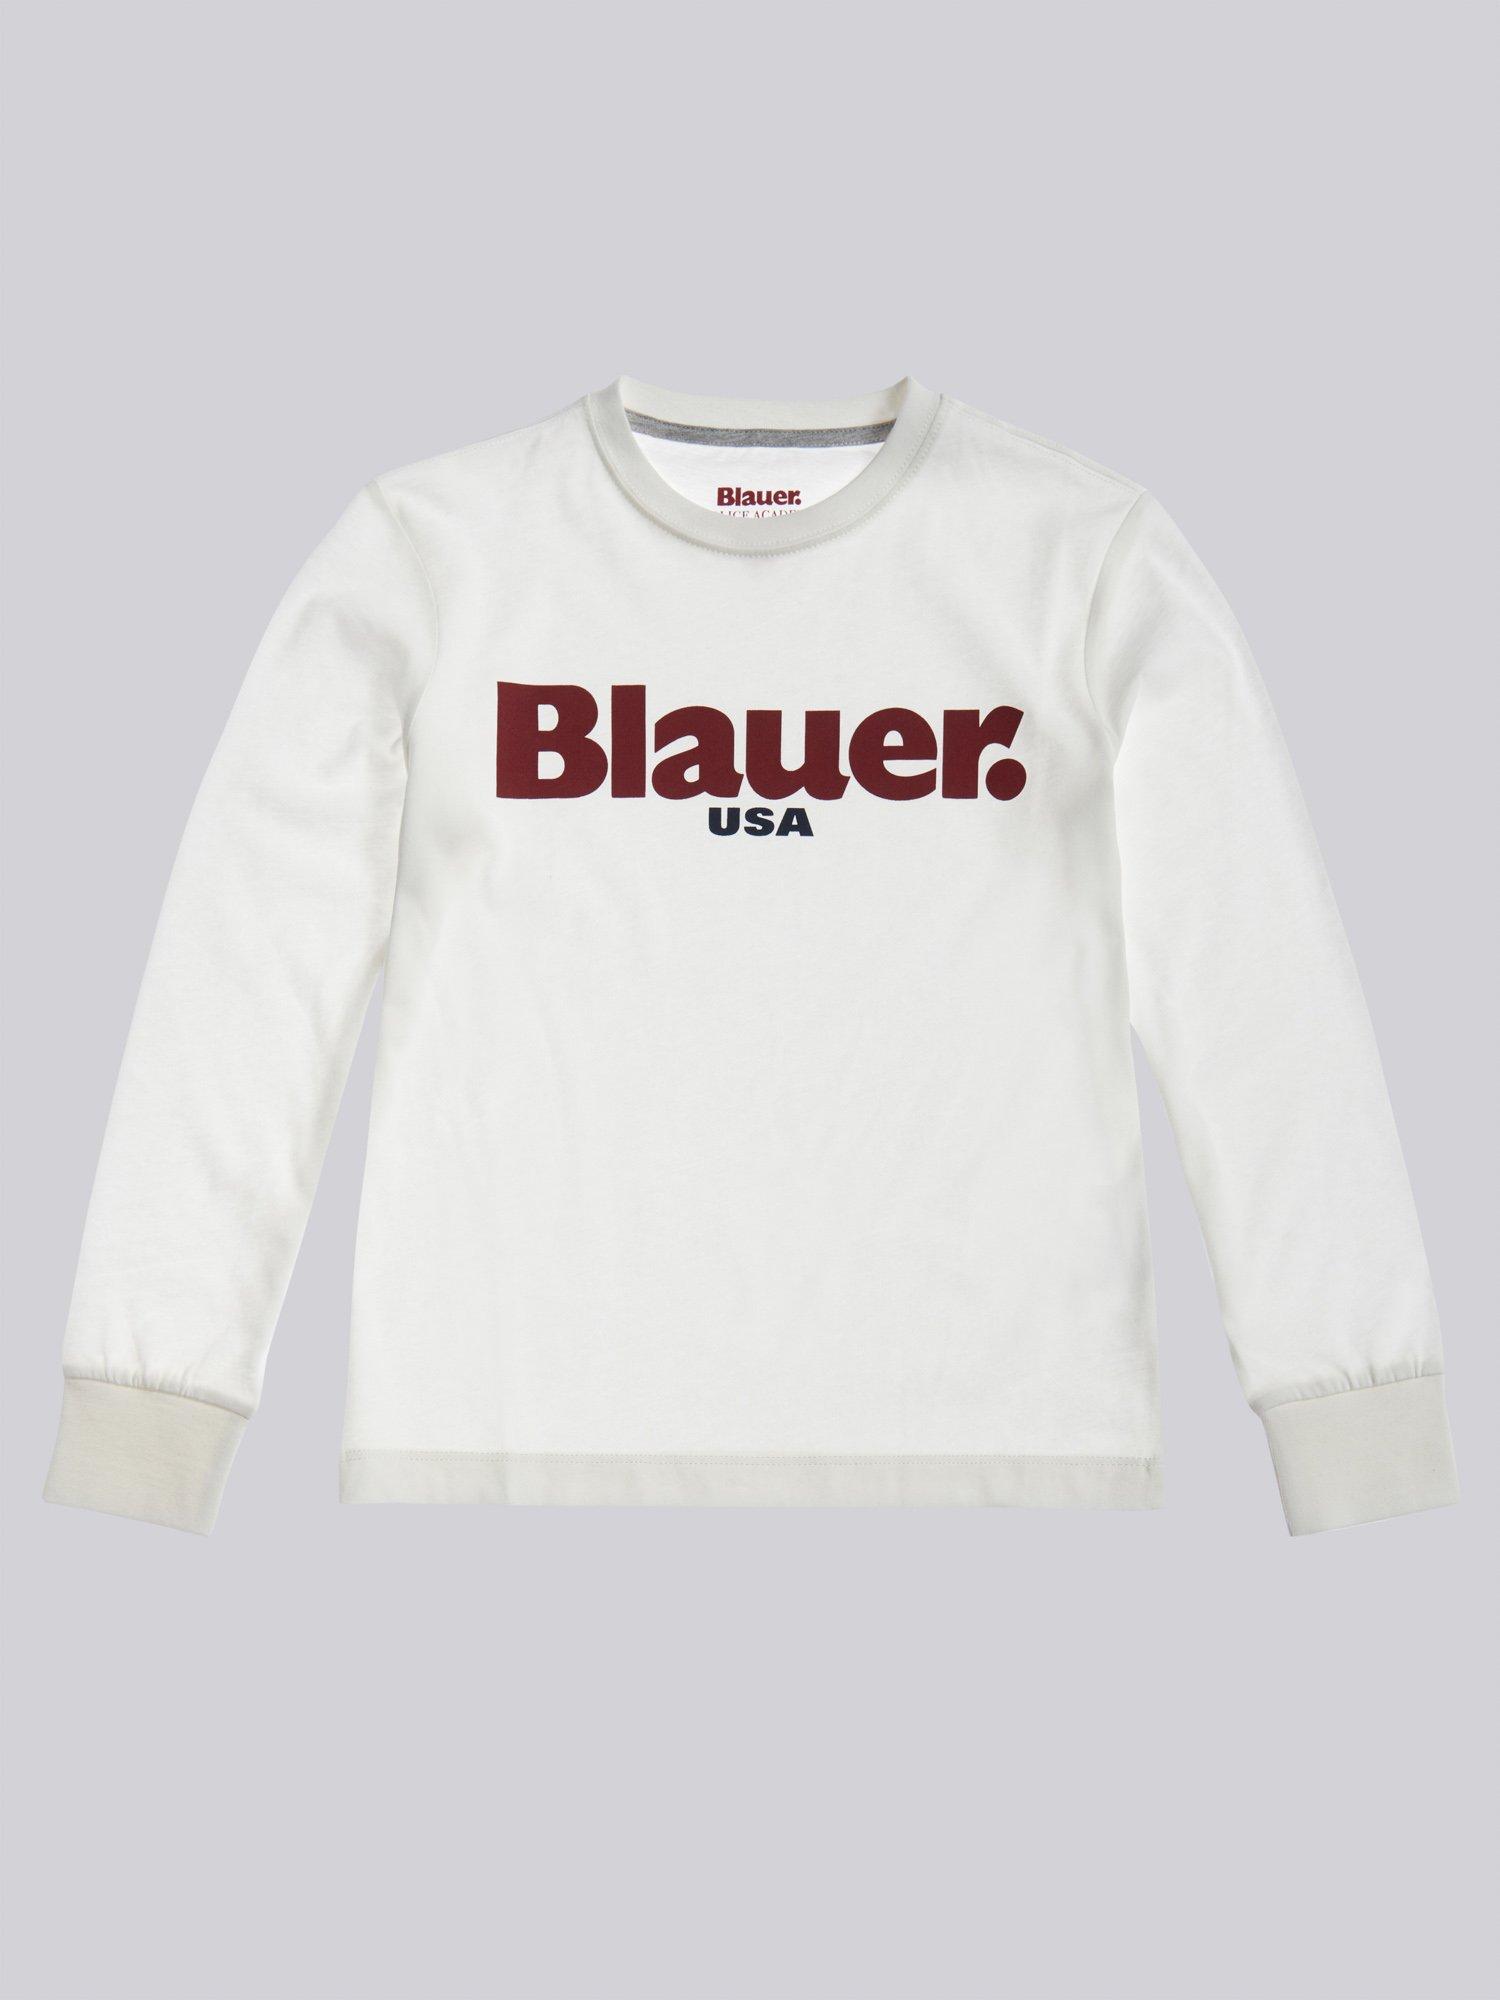 T-SHIRT MANICA LUNGA BLAUER - Blauer